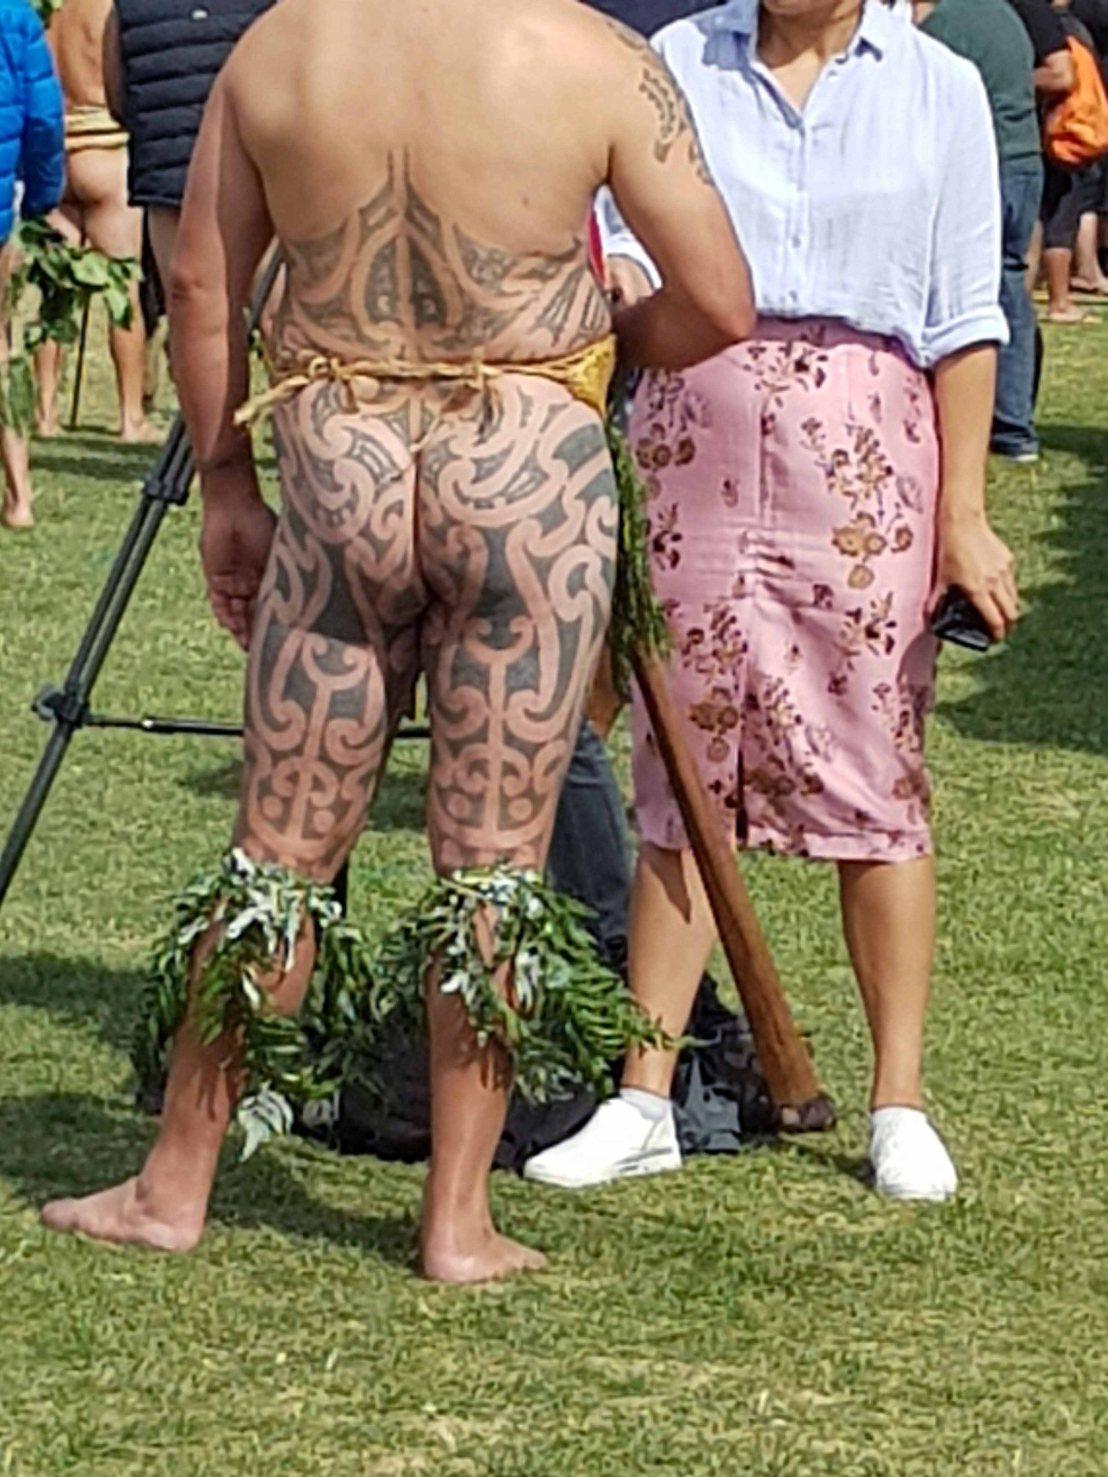 Kapa haka festival and competition inWellington